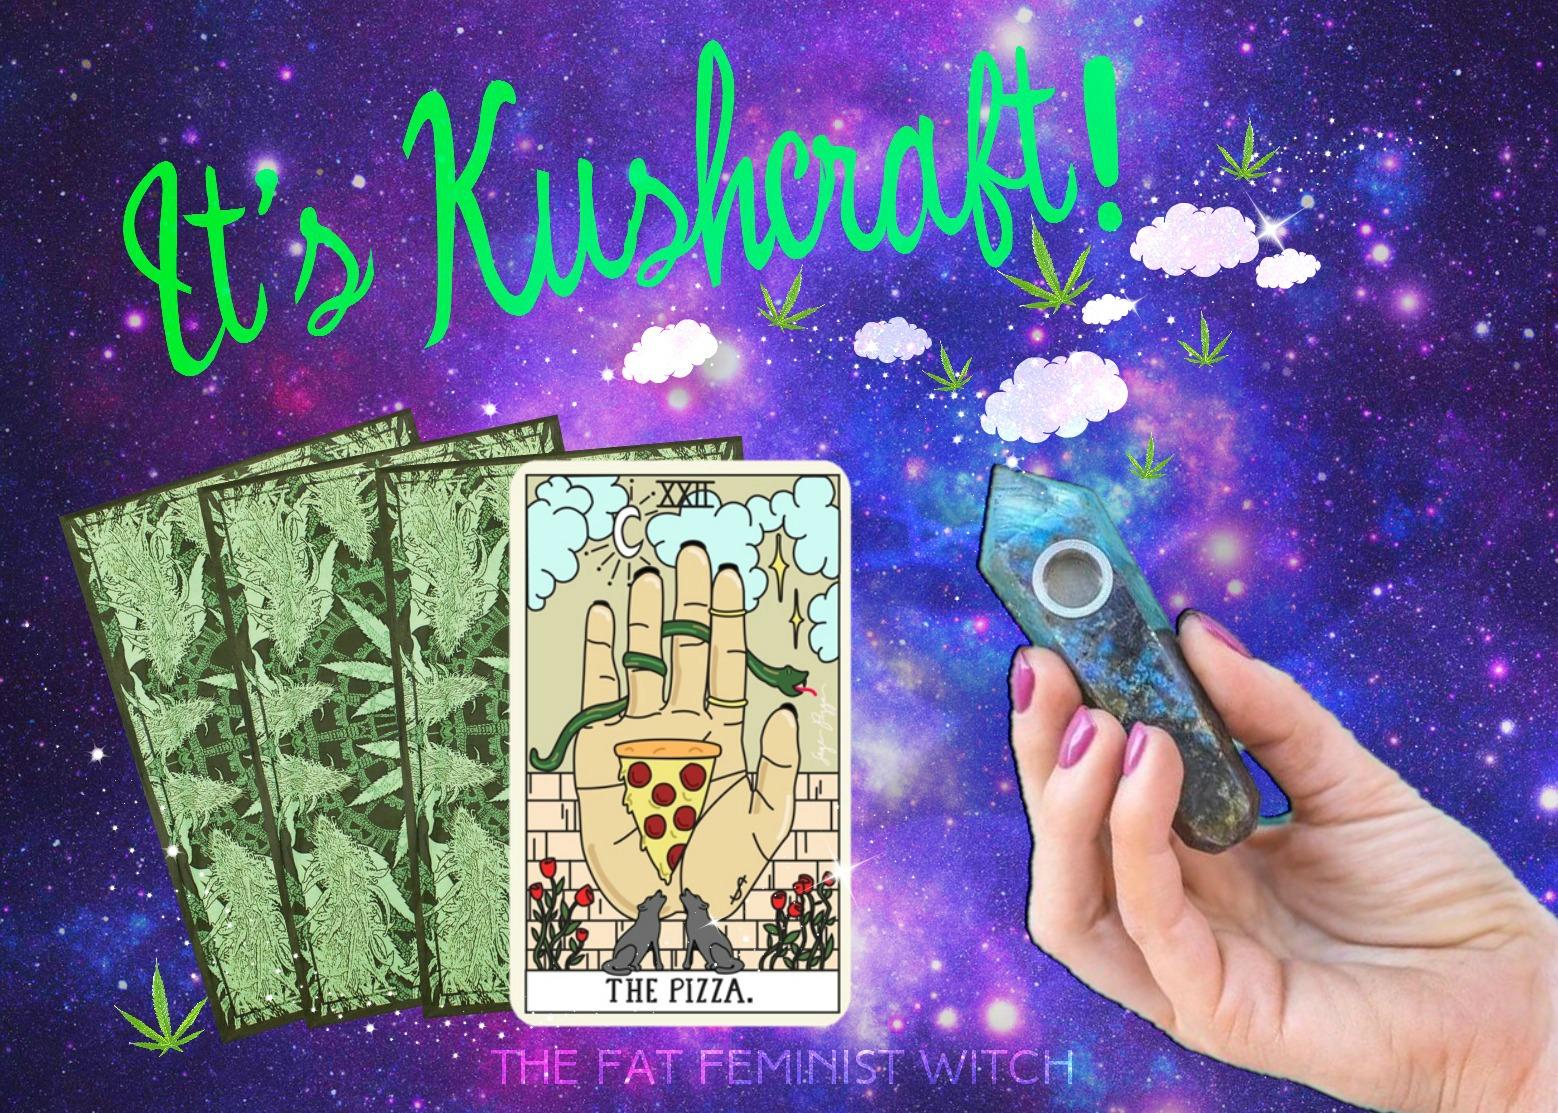 kushcraft